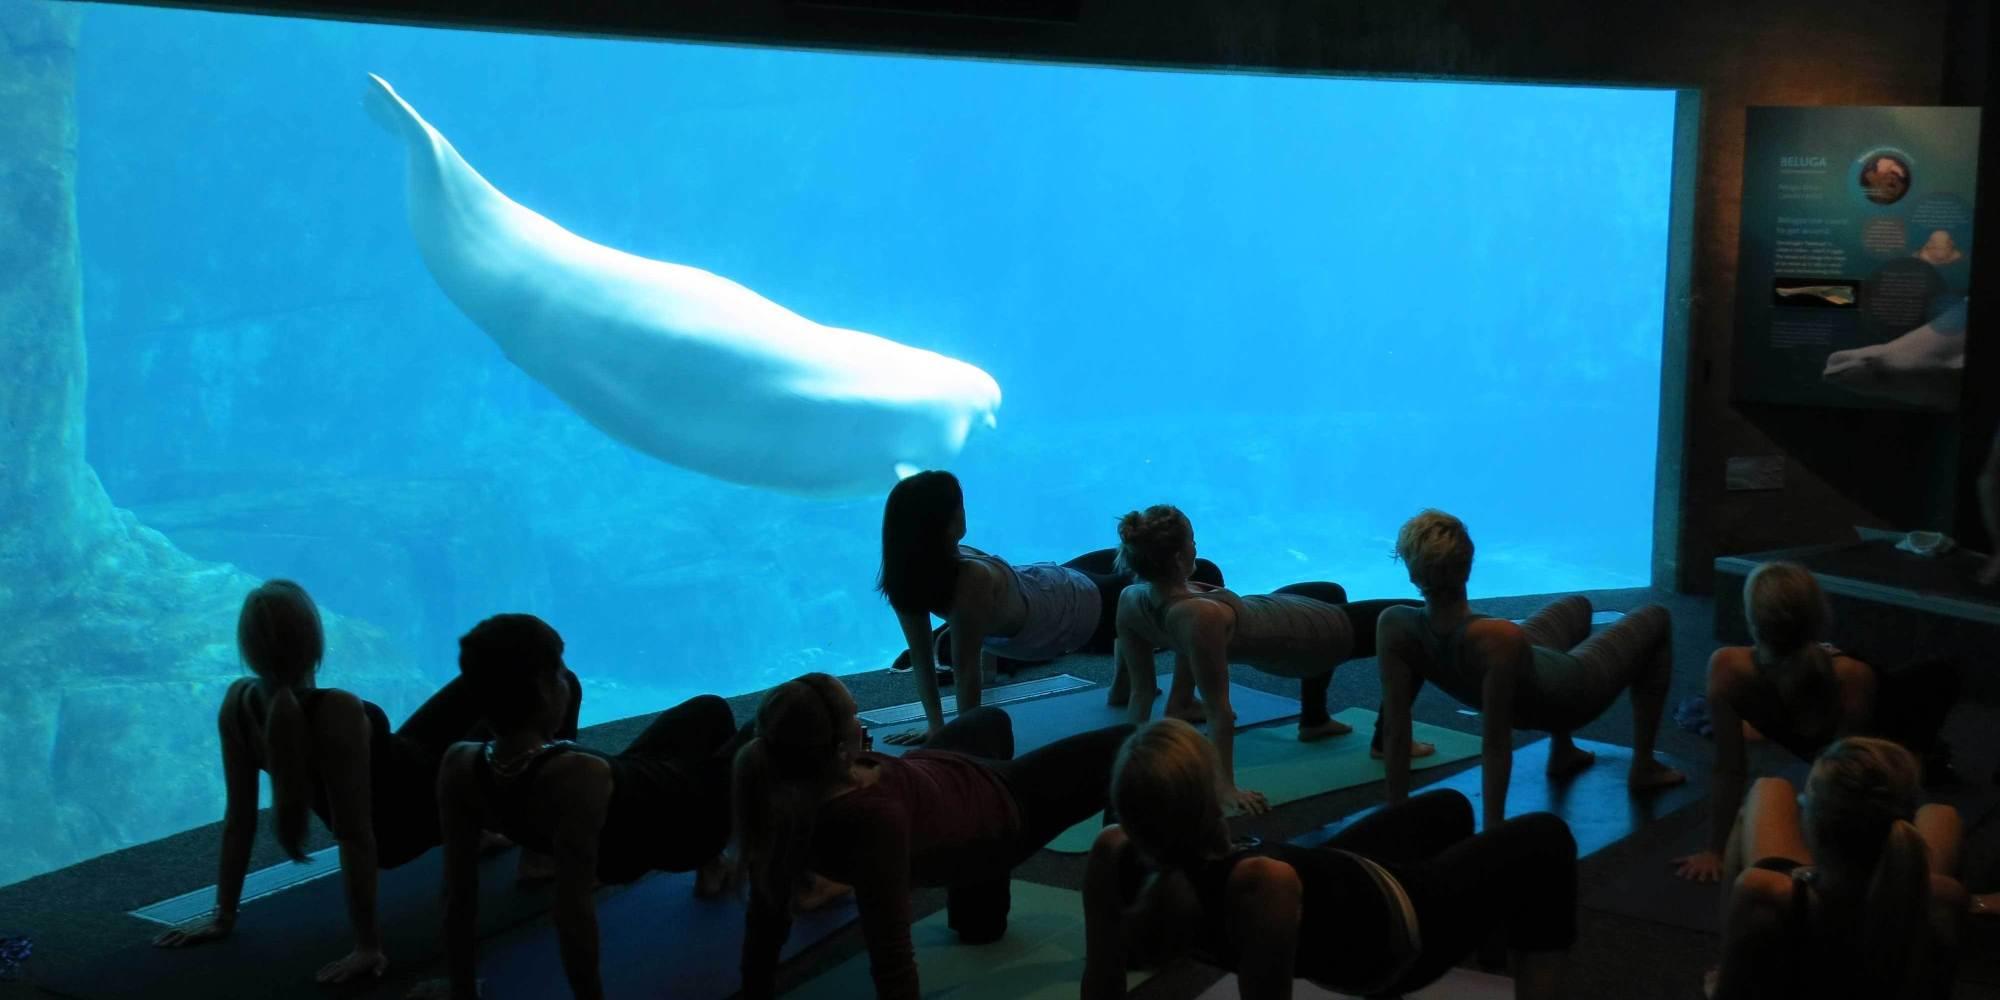 Yoga With Belugas At Vancouver Aquarium Draws Protests Video